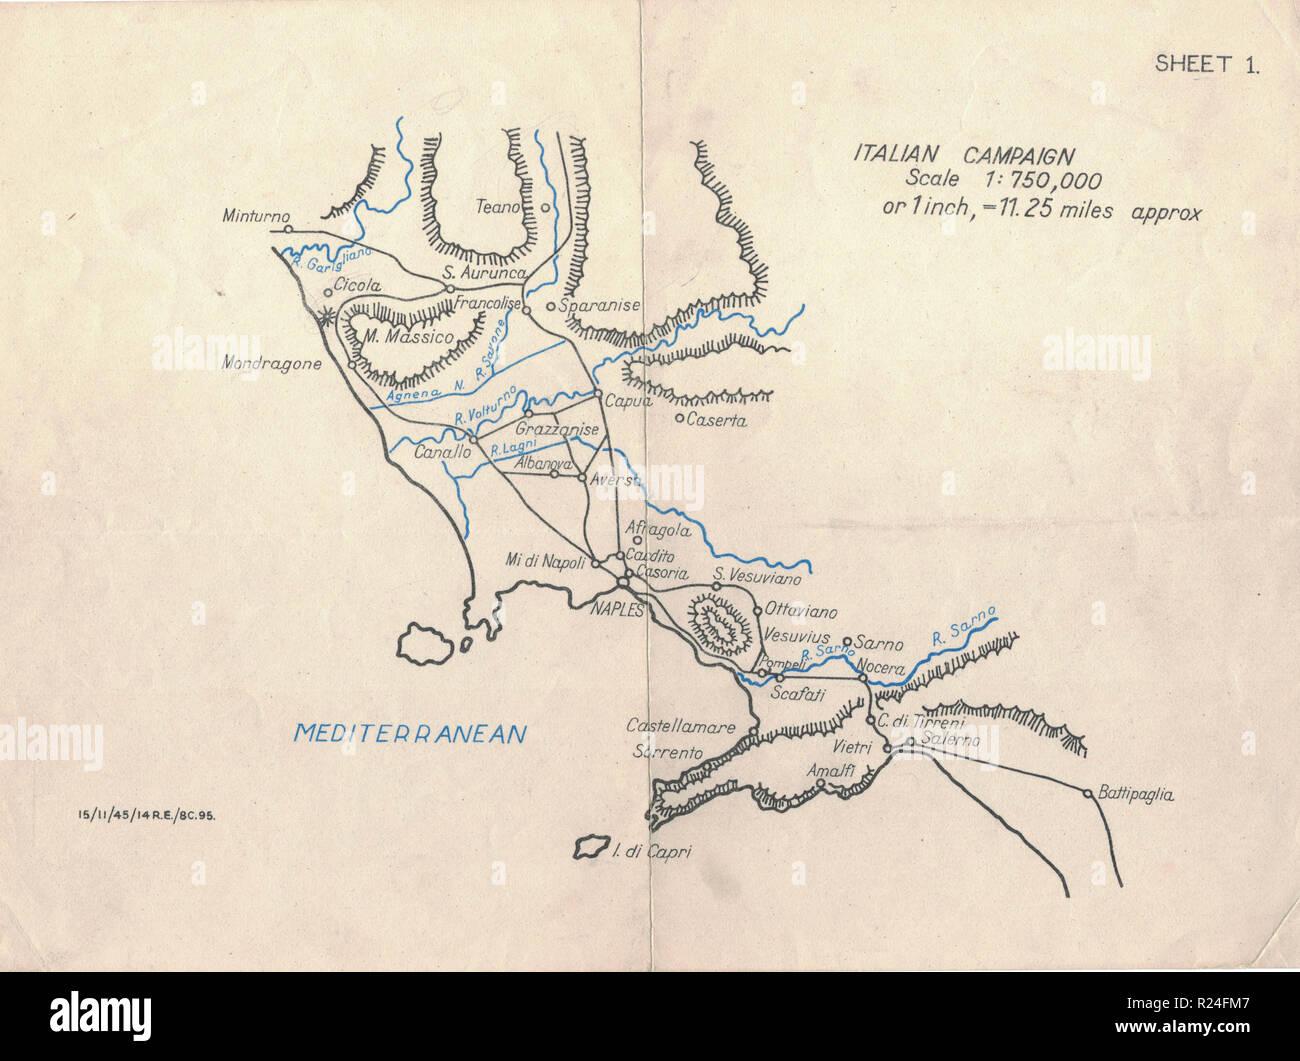 Guerra Mondiale 2 Campagna europea mappe 1945 Campagna italiana Immagini Stock